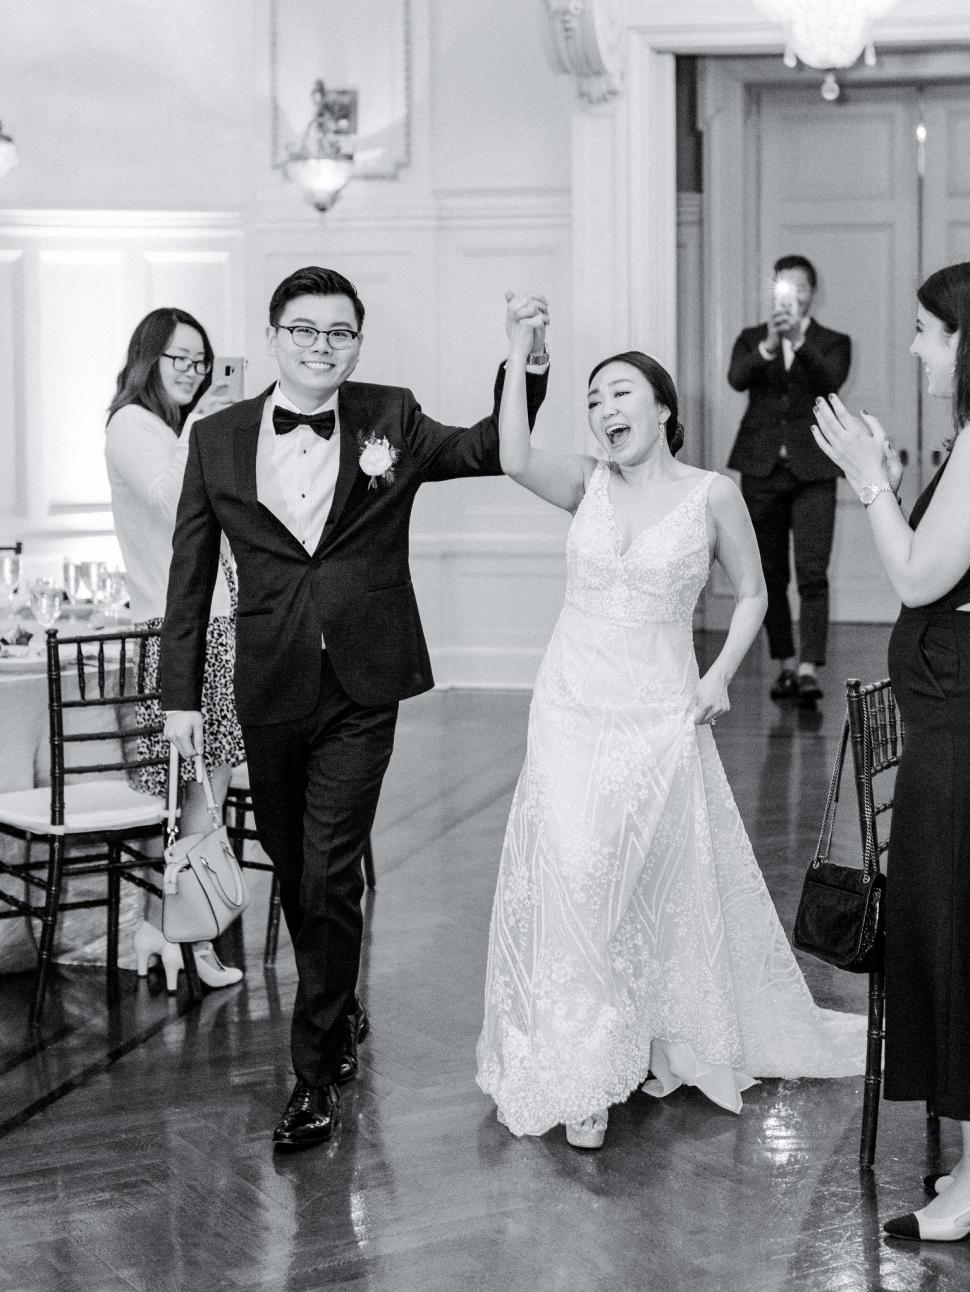 Bourne-Mansion-Wedding-Photos-Cassi-Claire-Long-Island-Wedding-Photographer_45.jpg